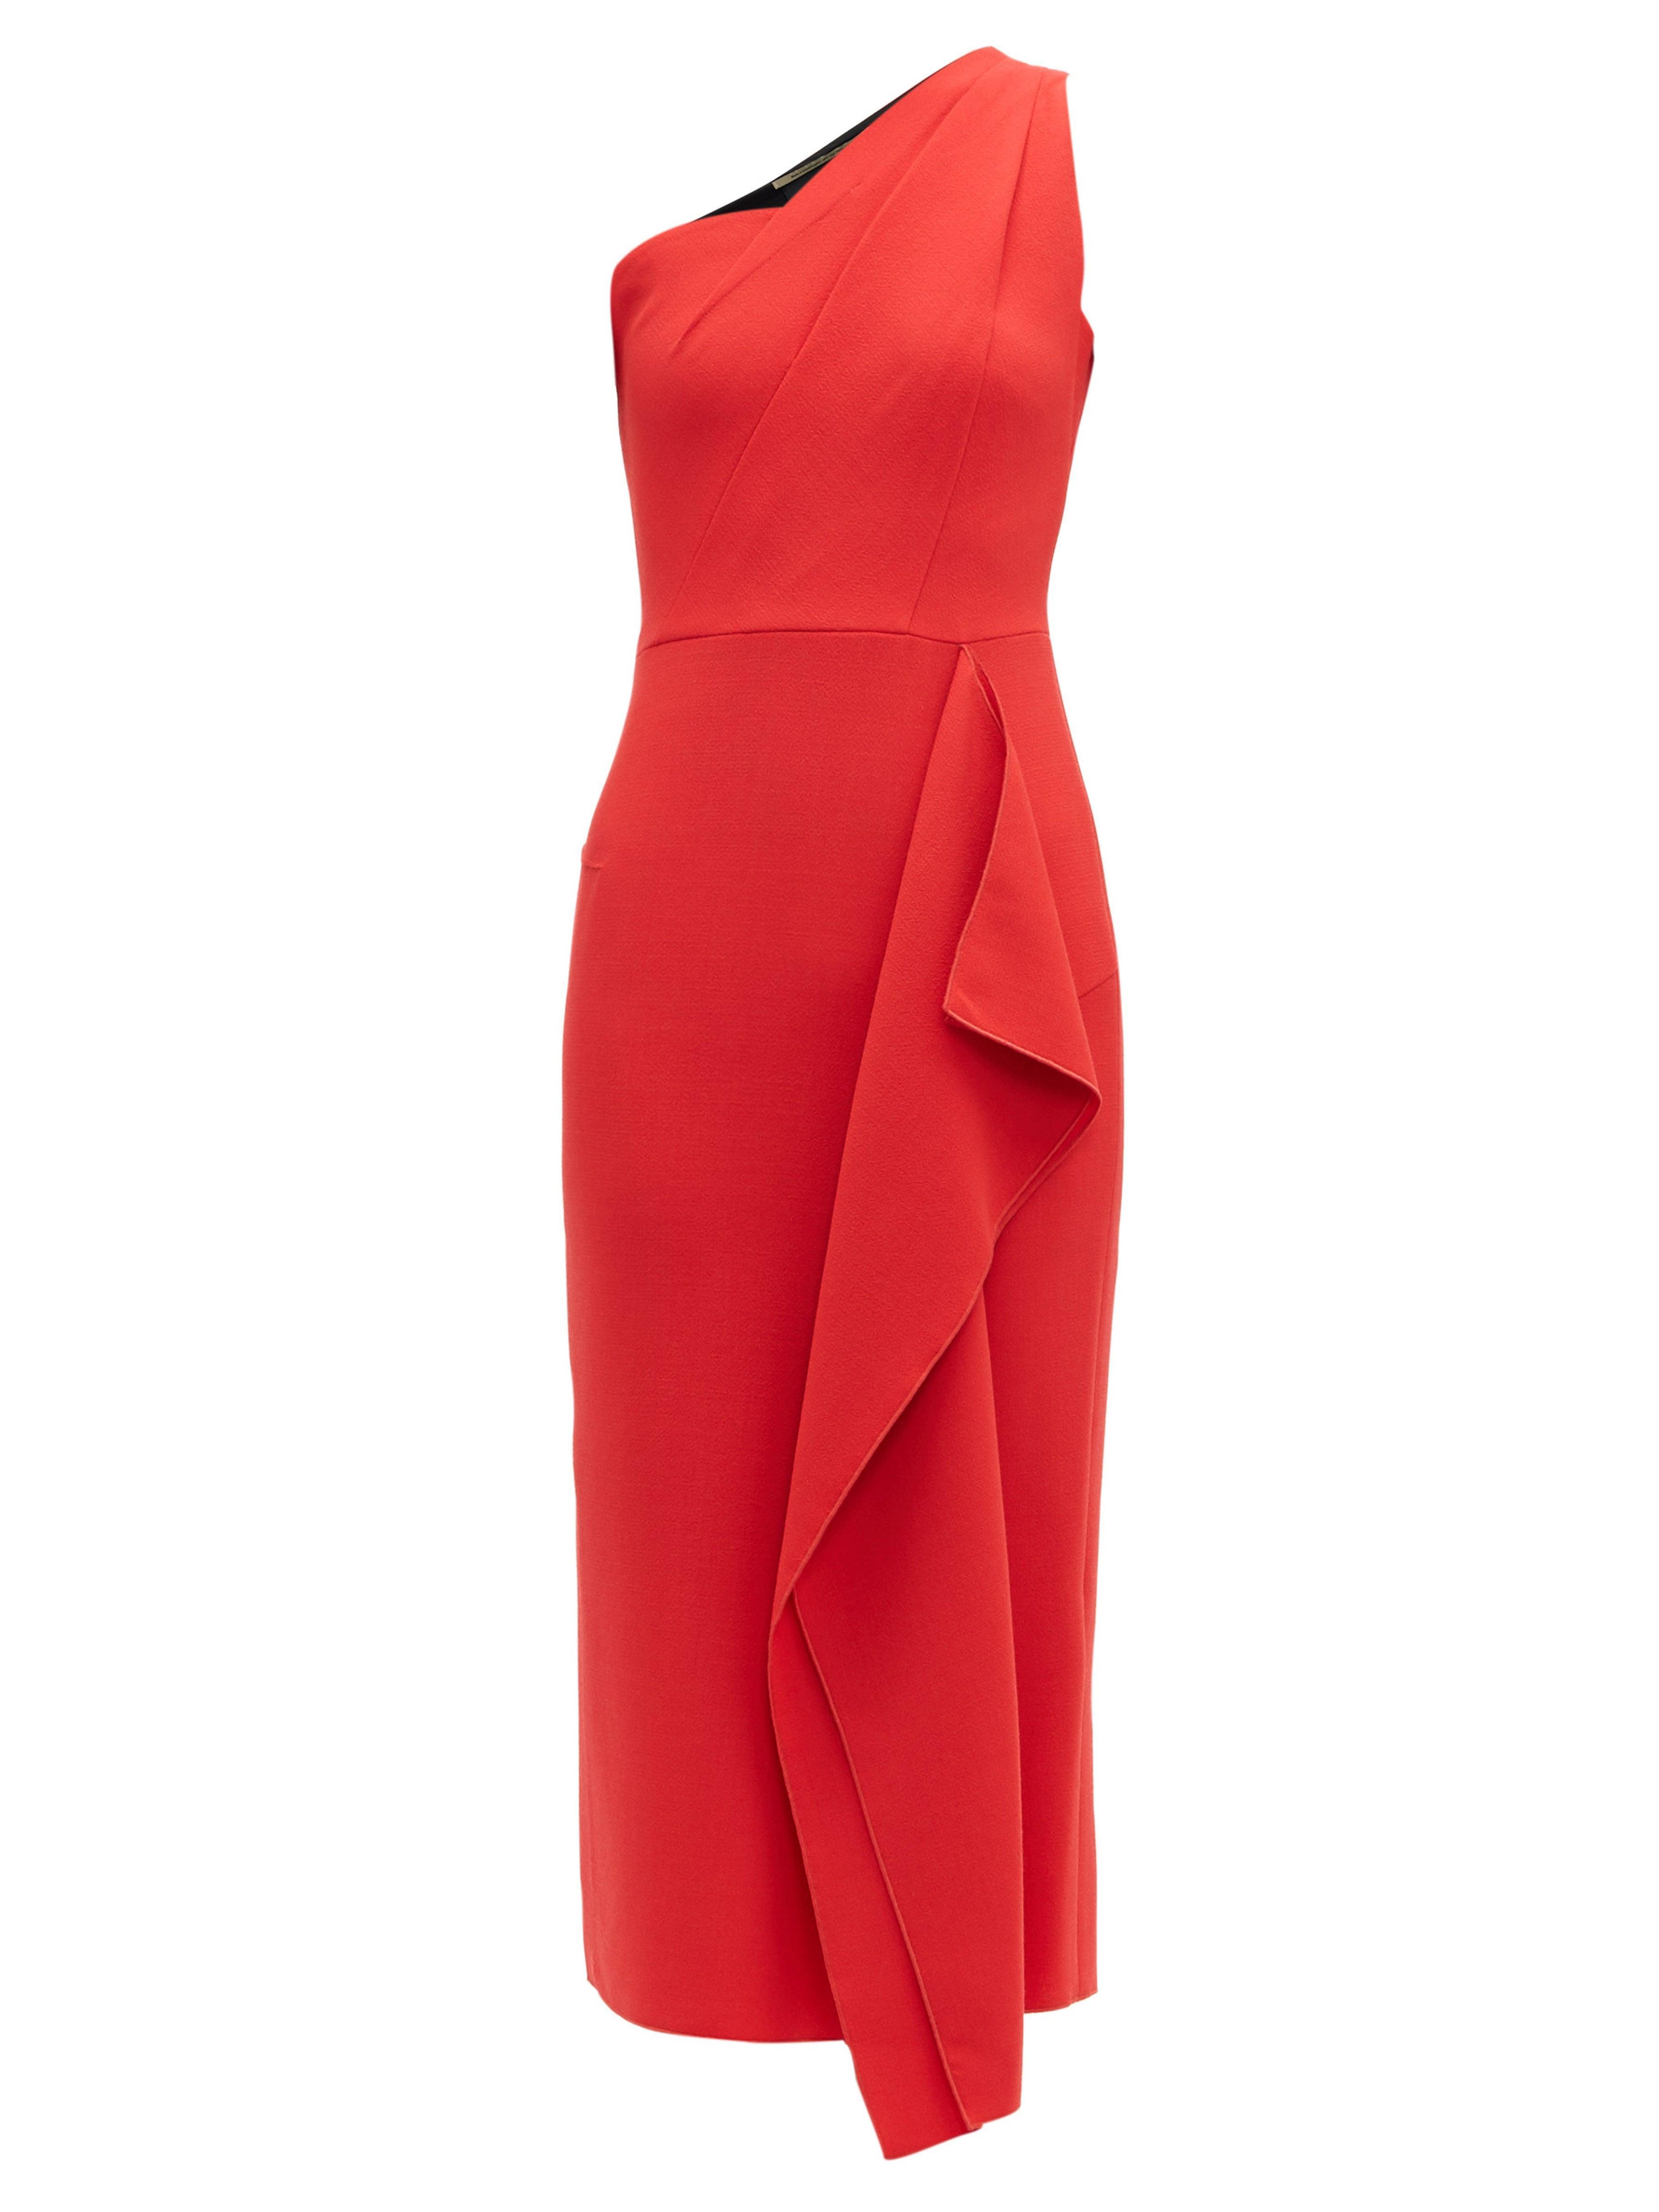 c125d6e31 Roland Mouret Rivoli One Shoulder Wool Crepe Dress in Red - Lyst